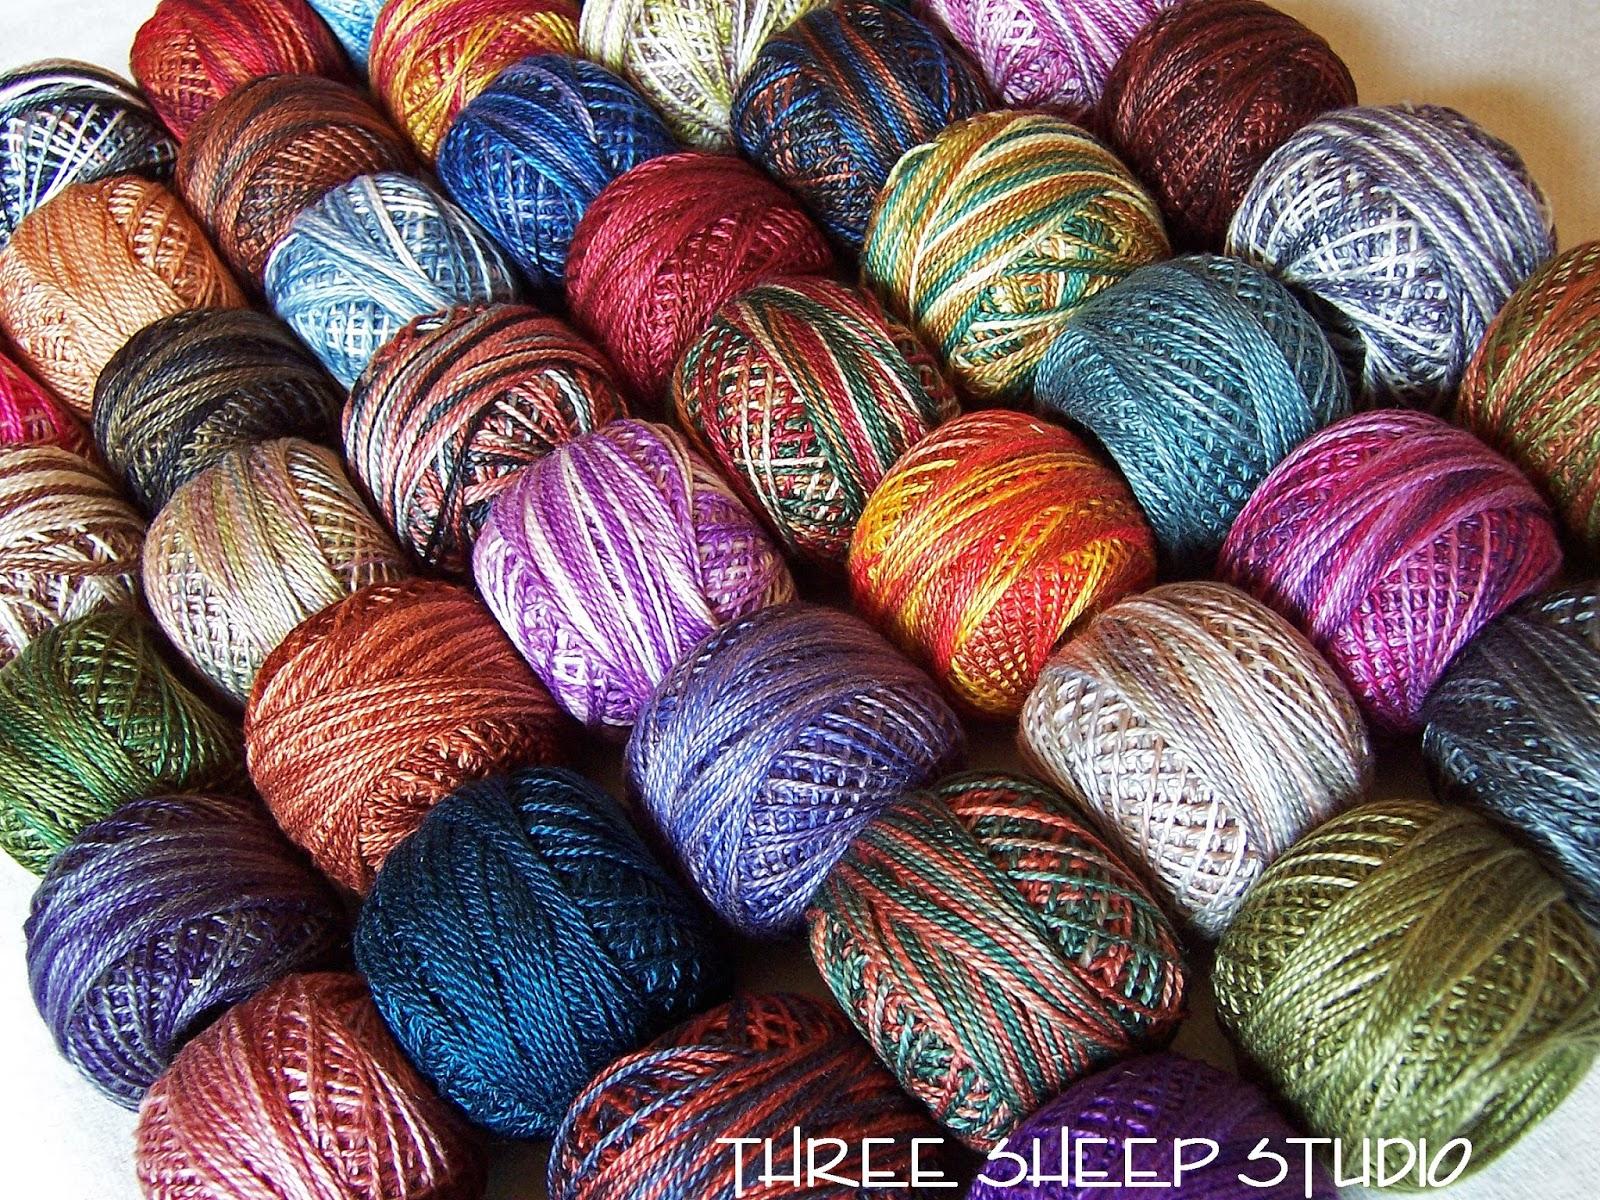 Three sheep studio thoughts on thread punch needle